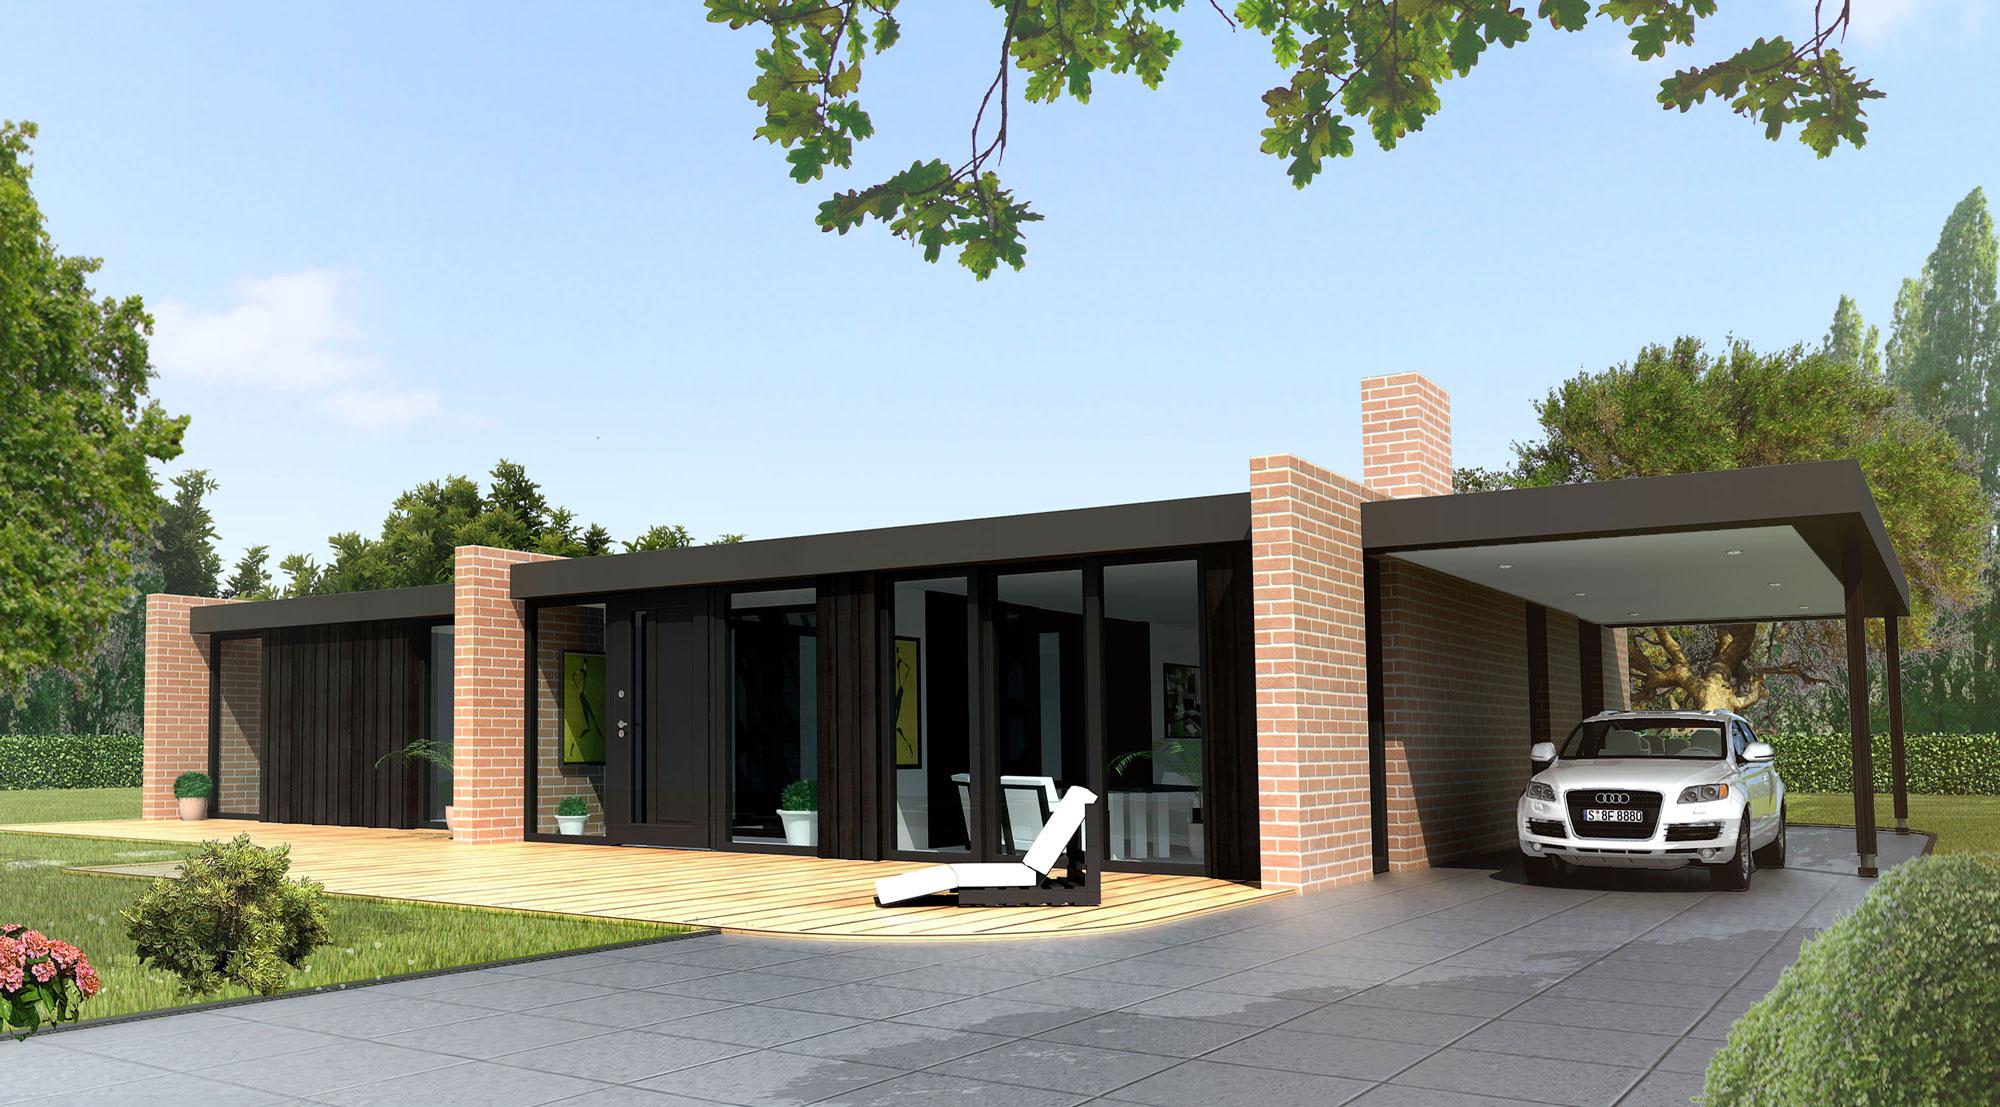 Maison cube plein pied moderne mc immo - Plan maison plein pied moderne ...